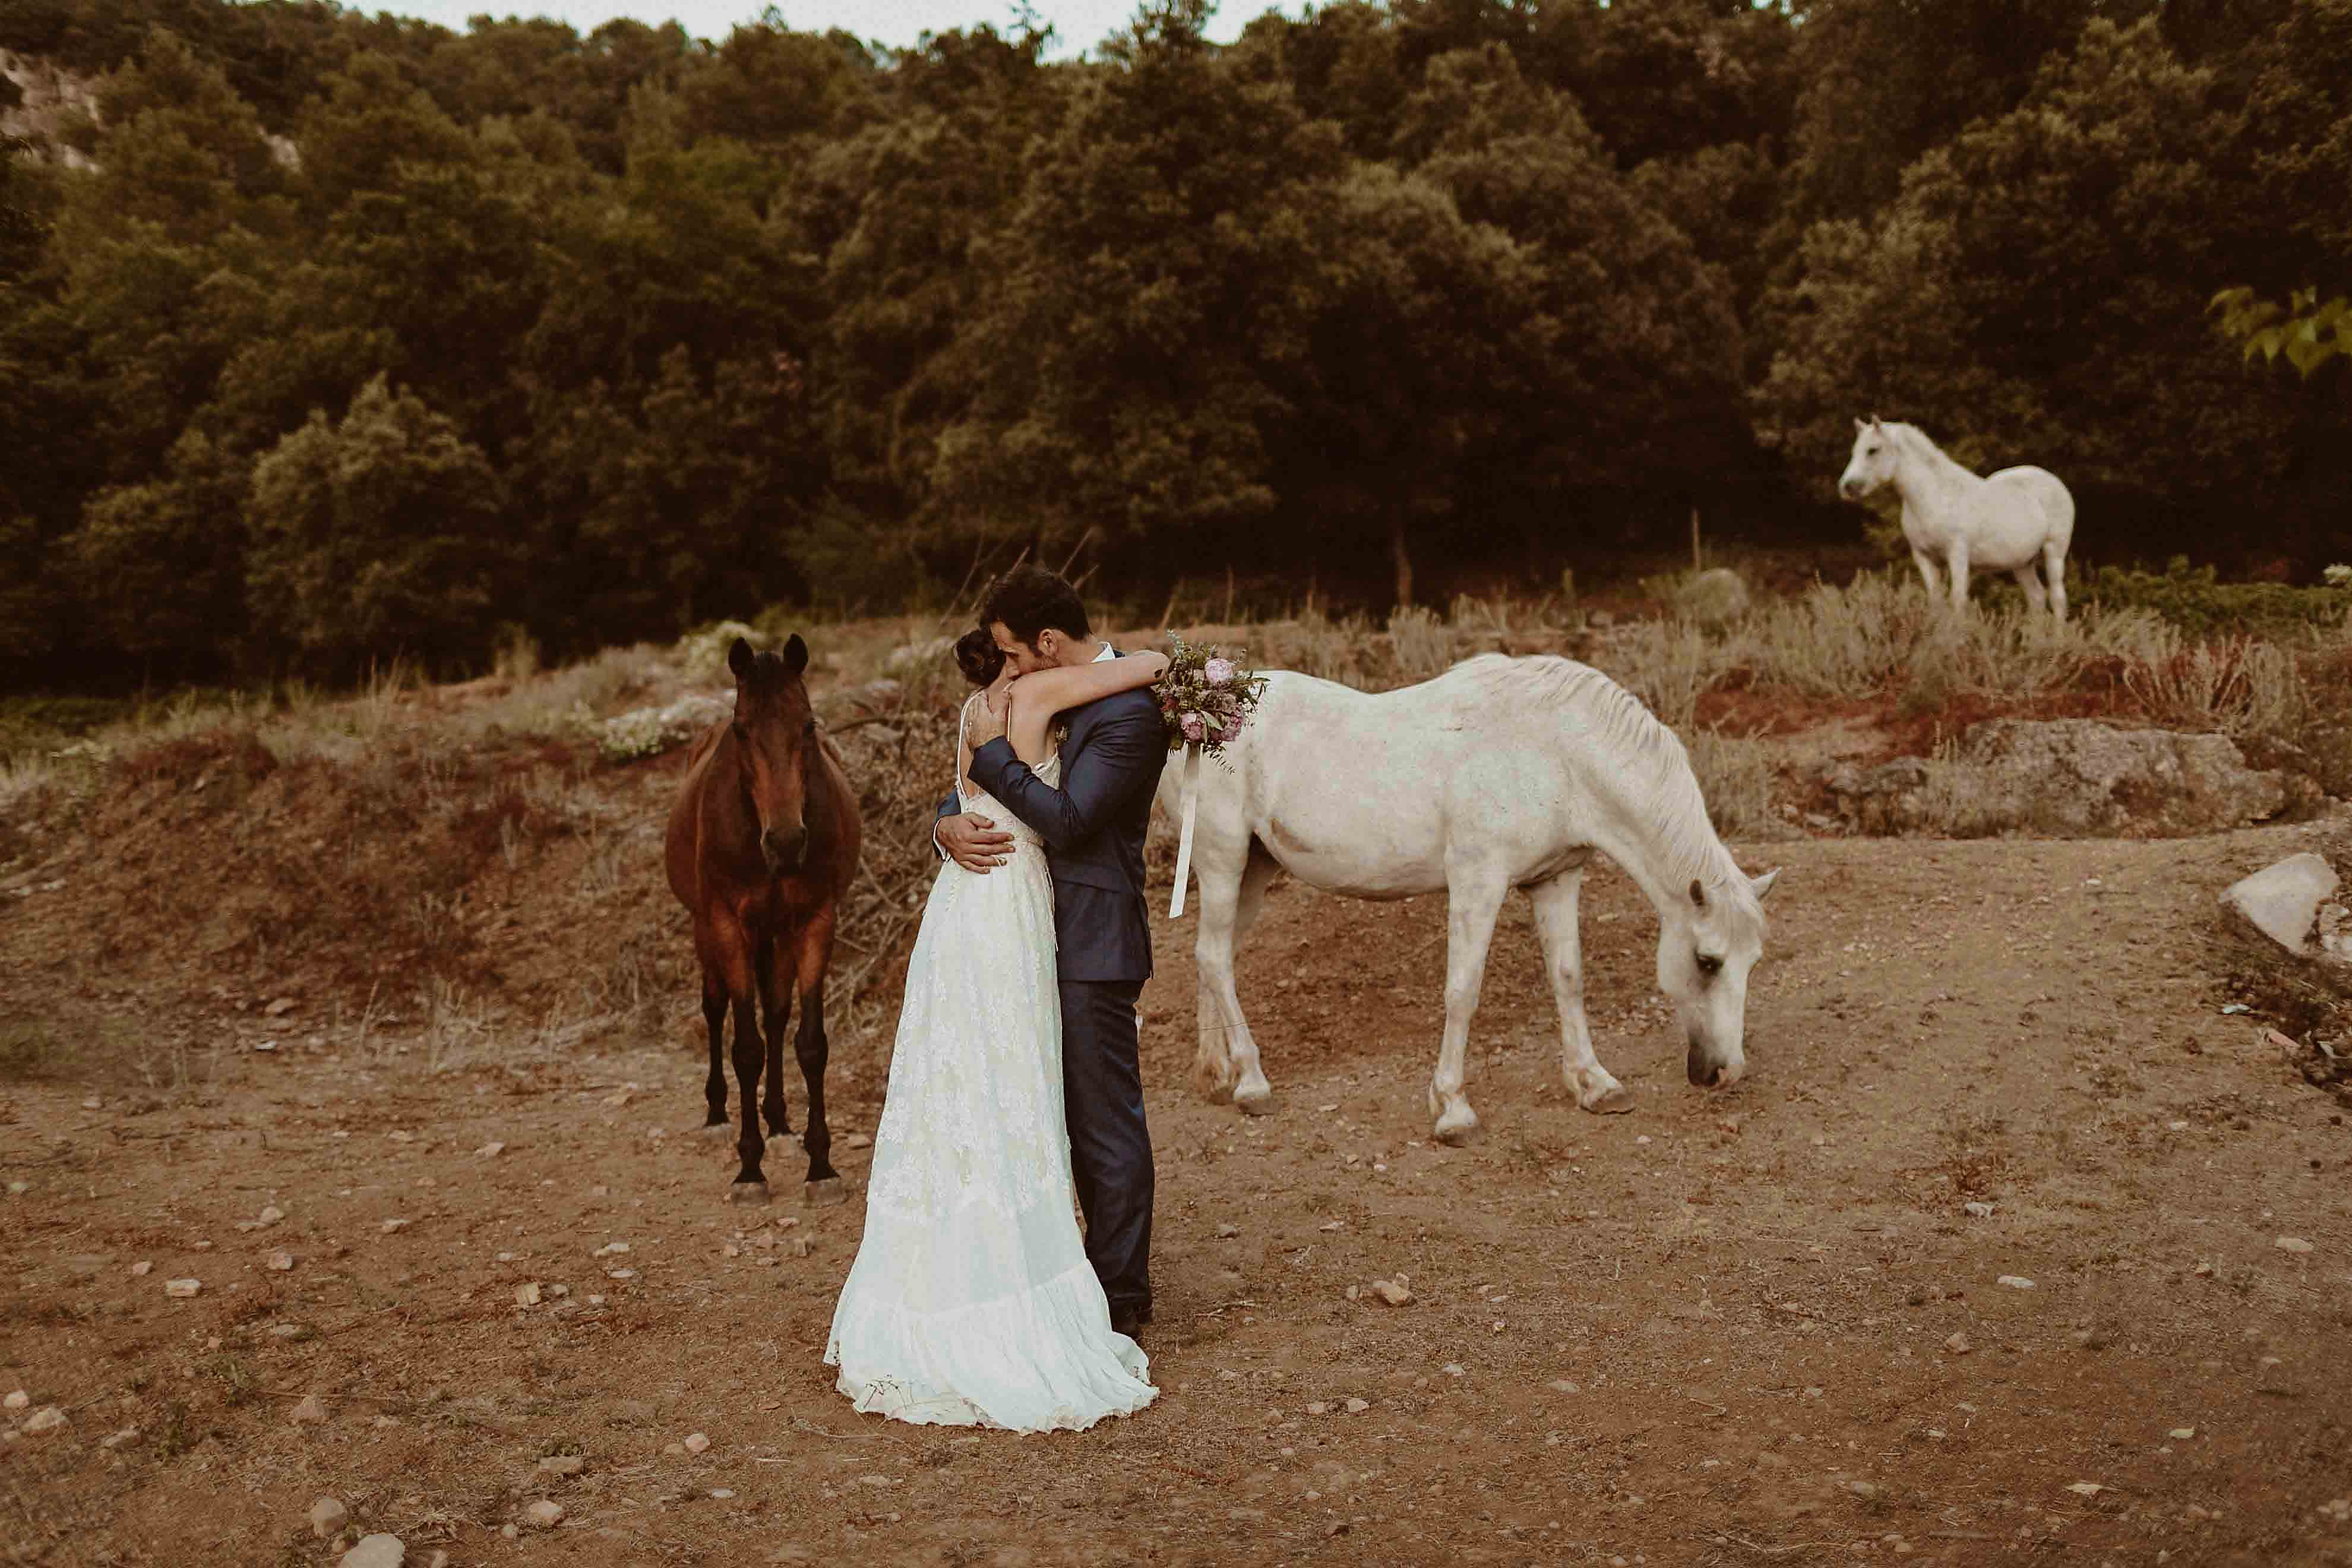 Boda rústica en la montaña. fotgrafo de bodas barcelona_093